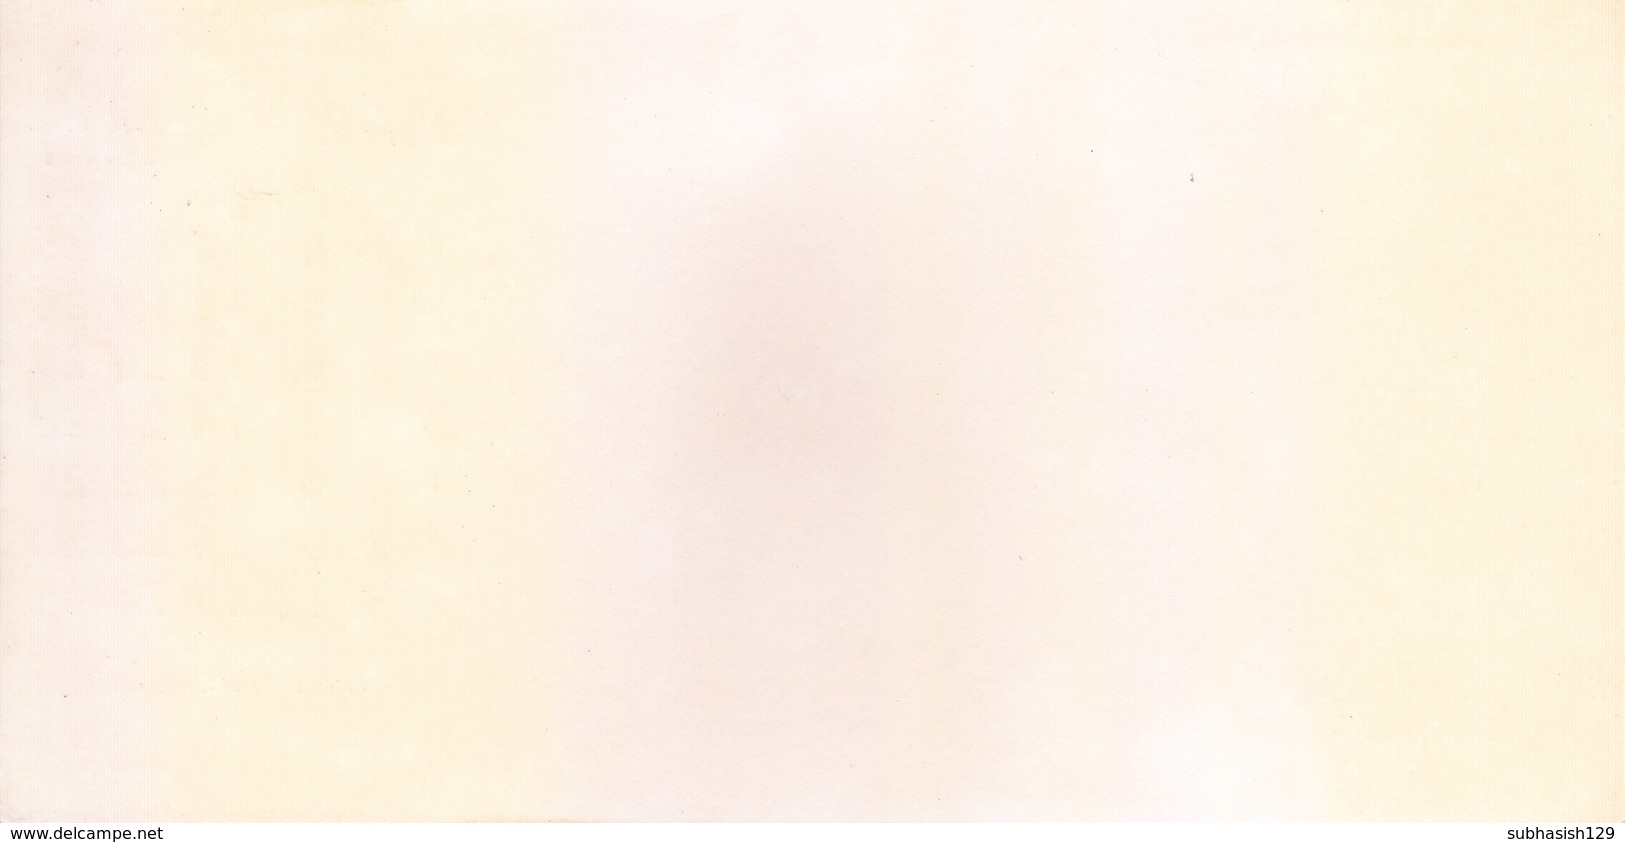 INDIA - RARE AND OLD PAPER CALENDAR - NOVEMBER 1973 -  PRINTED HAND SKETCH - KONARK TEMPLE, ORISSA - ANTIQUE ITEM - Big : 1971-80